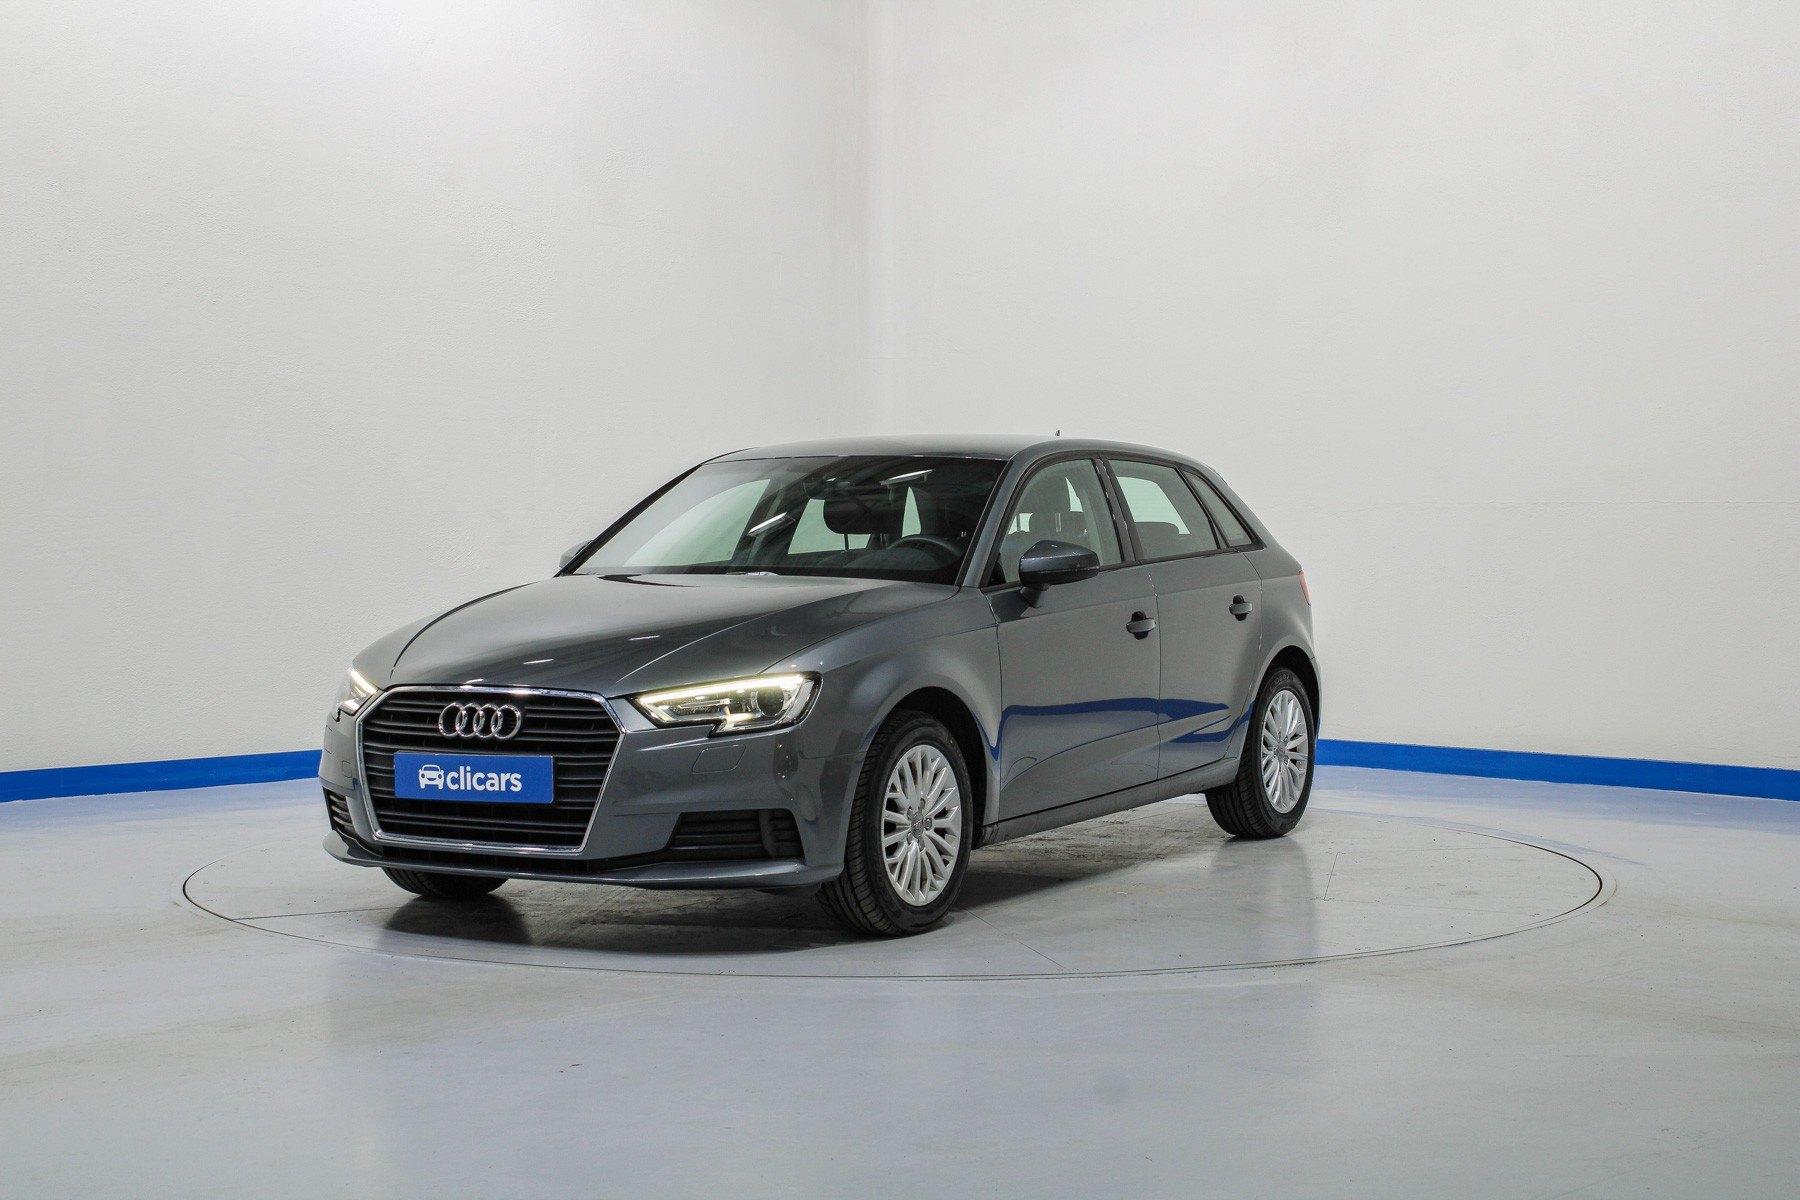 Audi A3 Diésel 1.6 TDI S tronic Sportback 1